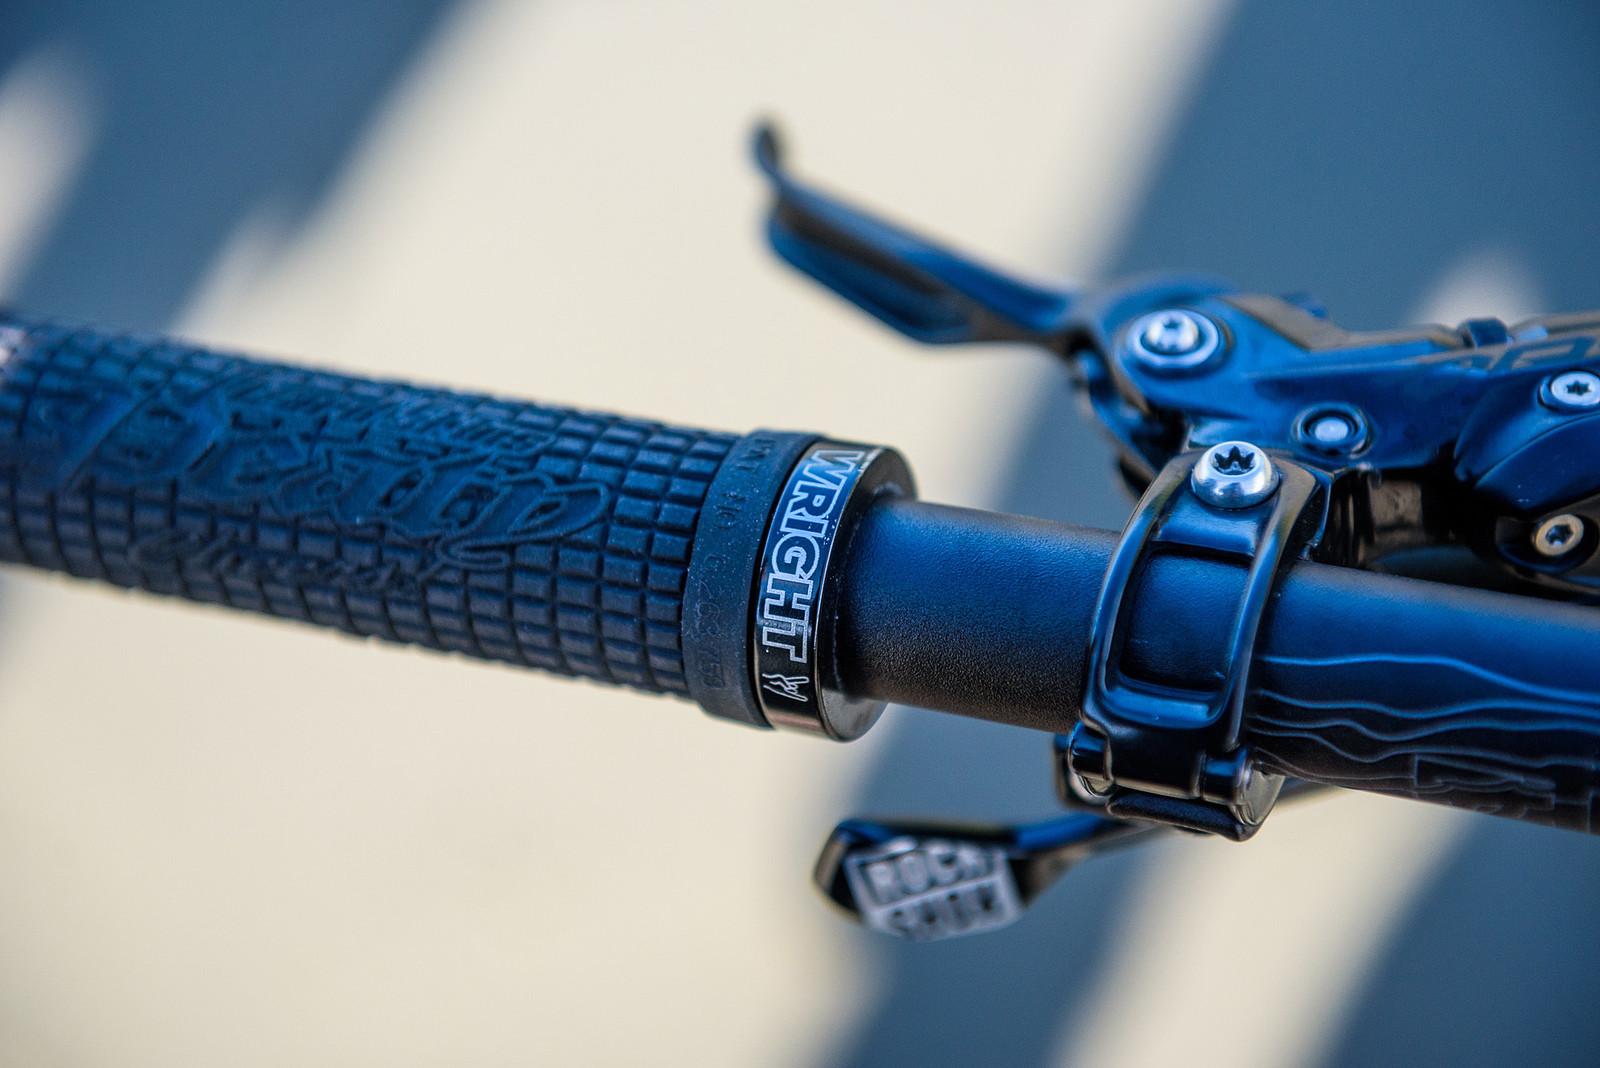 Lizard Skins Peaty Grips - Keegan Wright's Prototype Devinci 29er Enduro Machine - Mountain Biking Pictures - Vital MTB